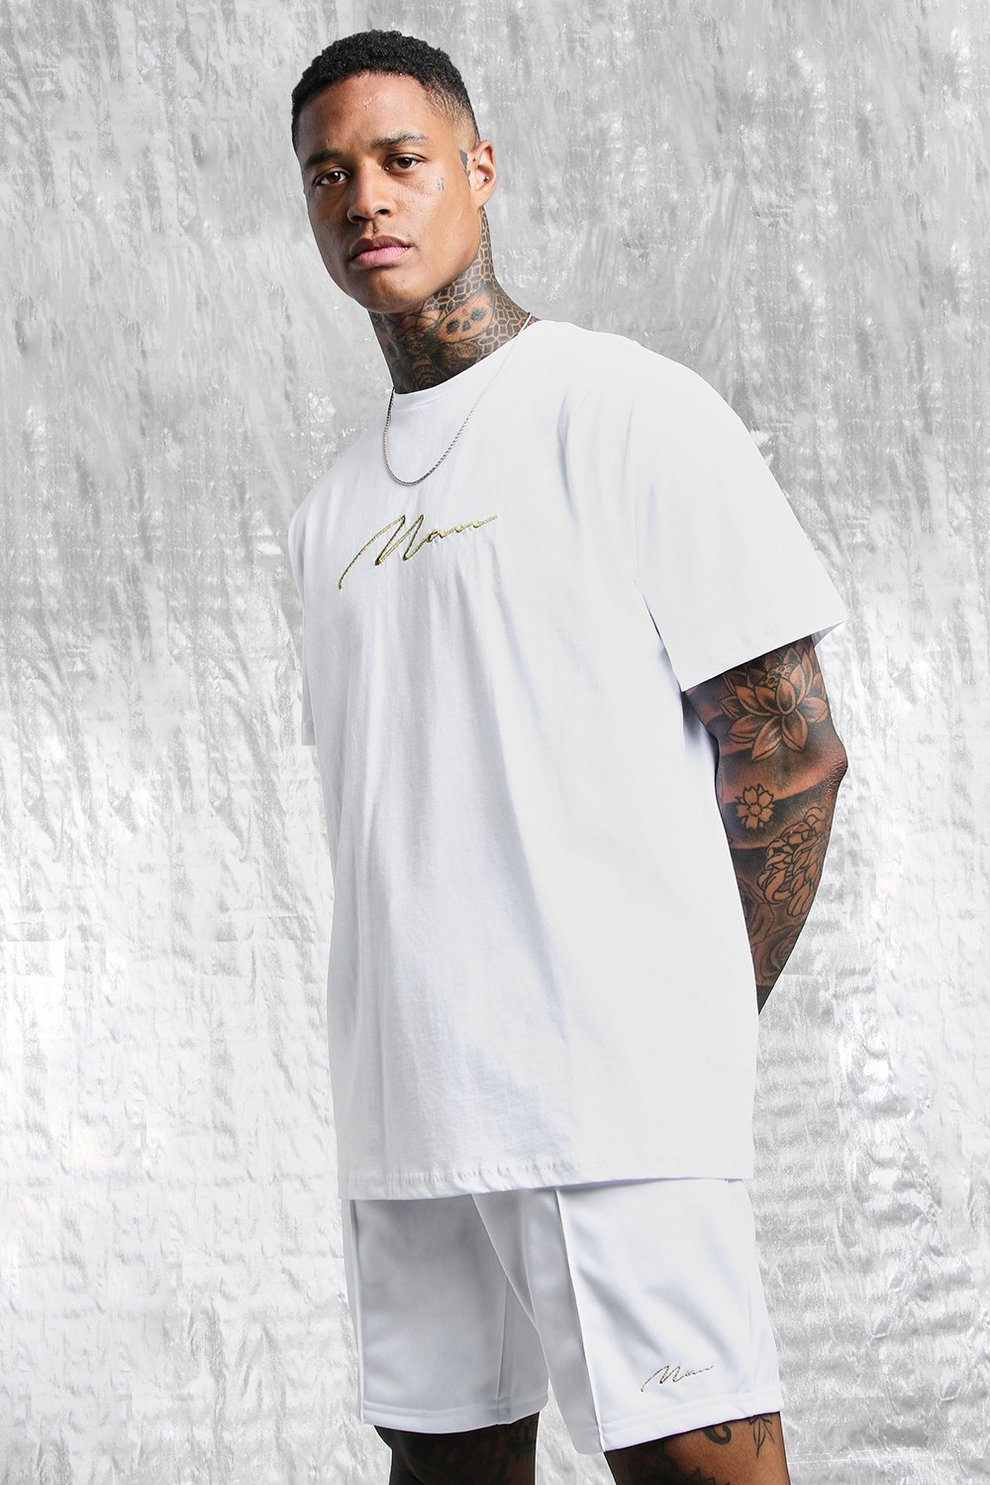 9a5615826 White & Gold MAN Oversized Back Print T-Shirt - boohooMAN